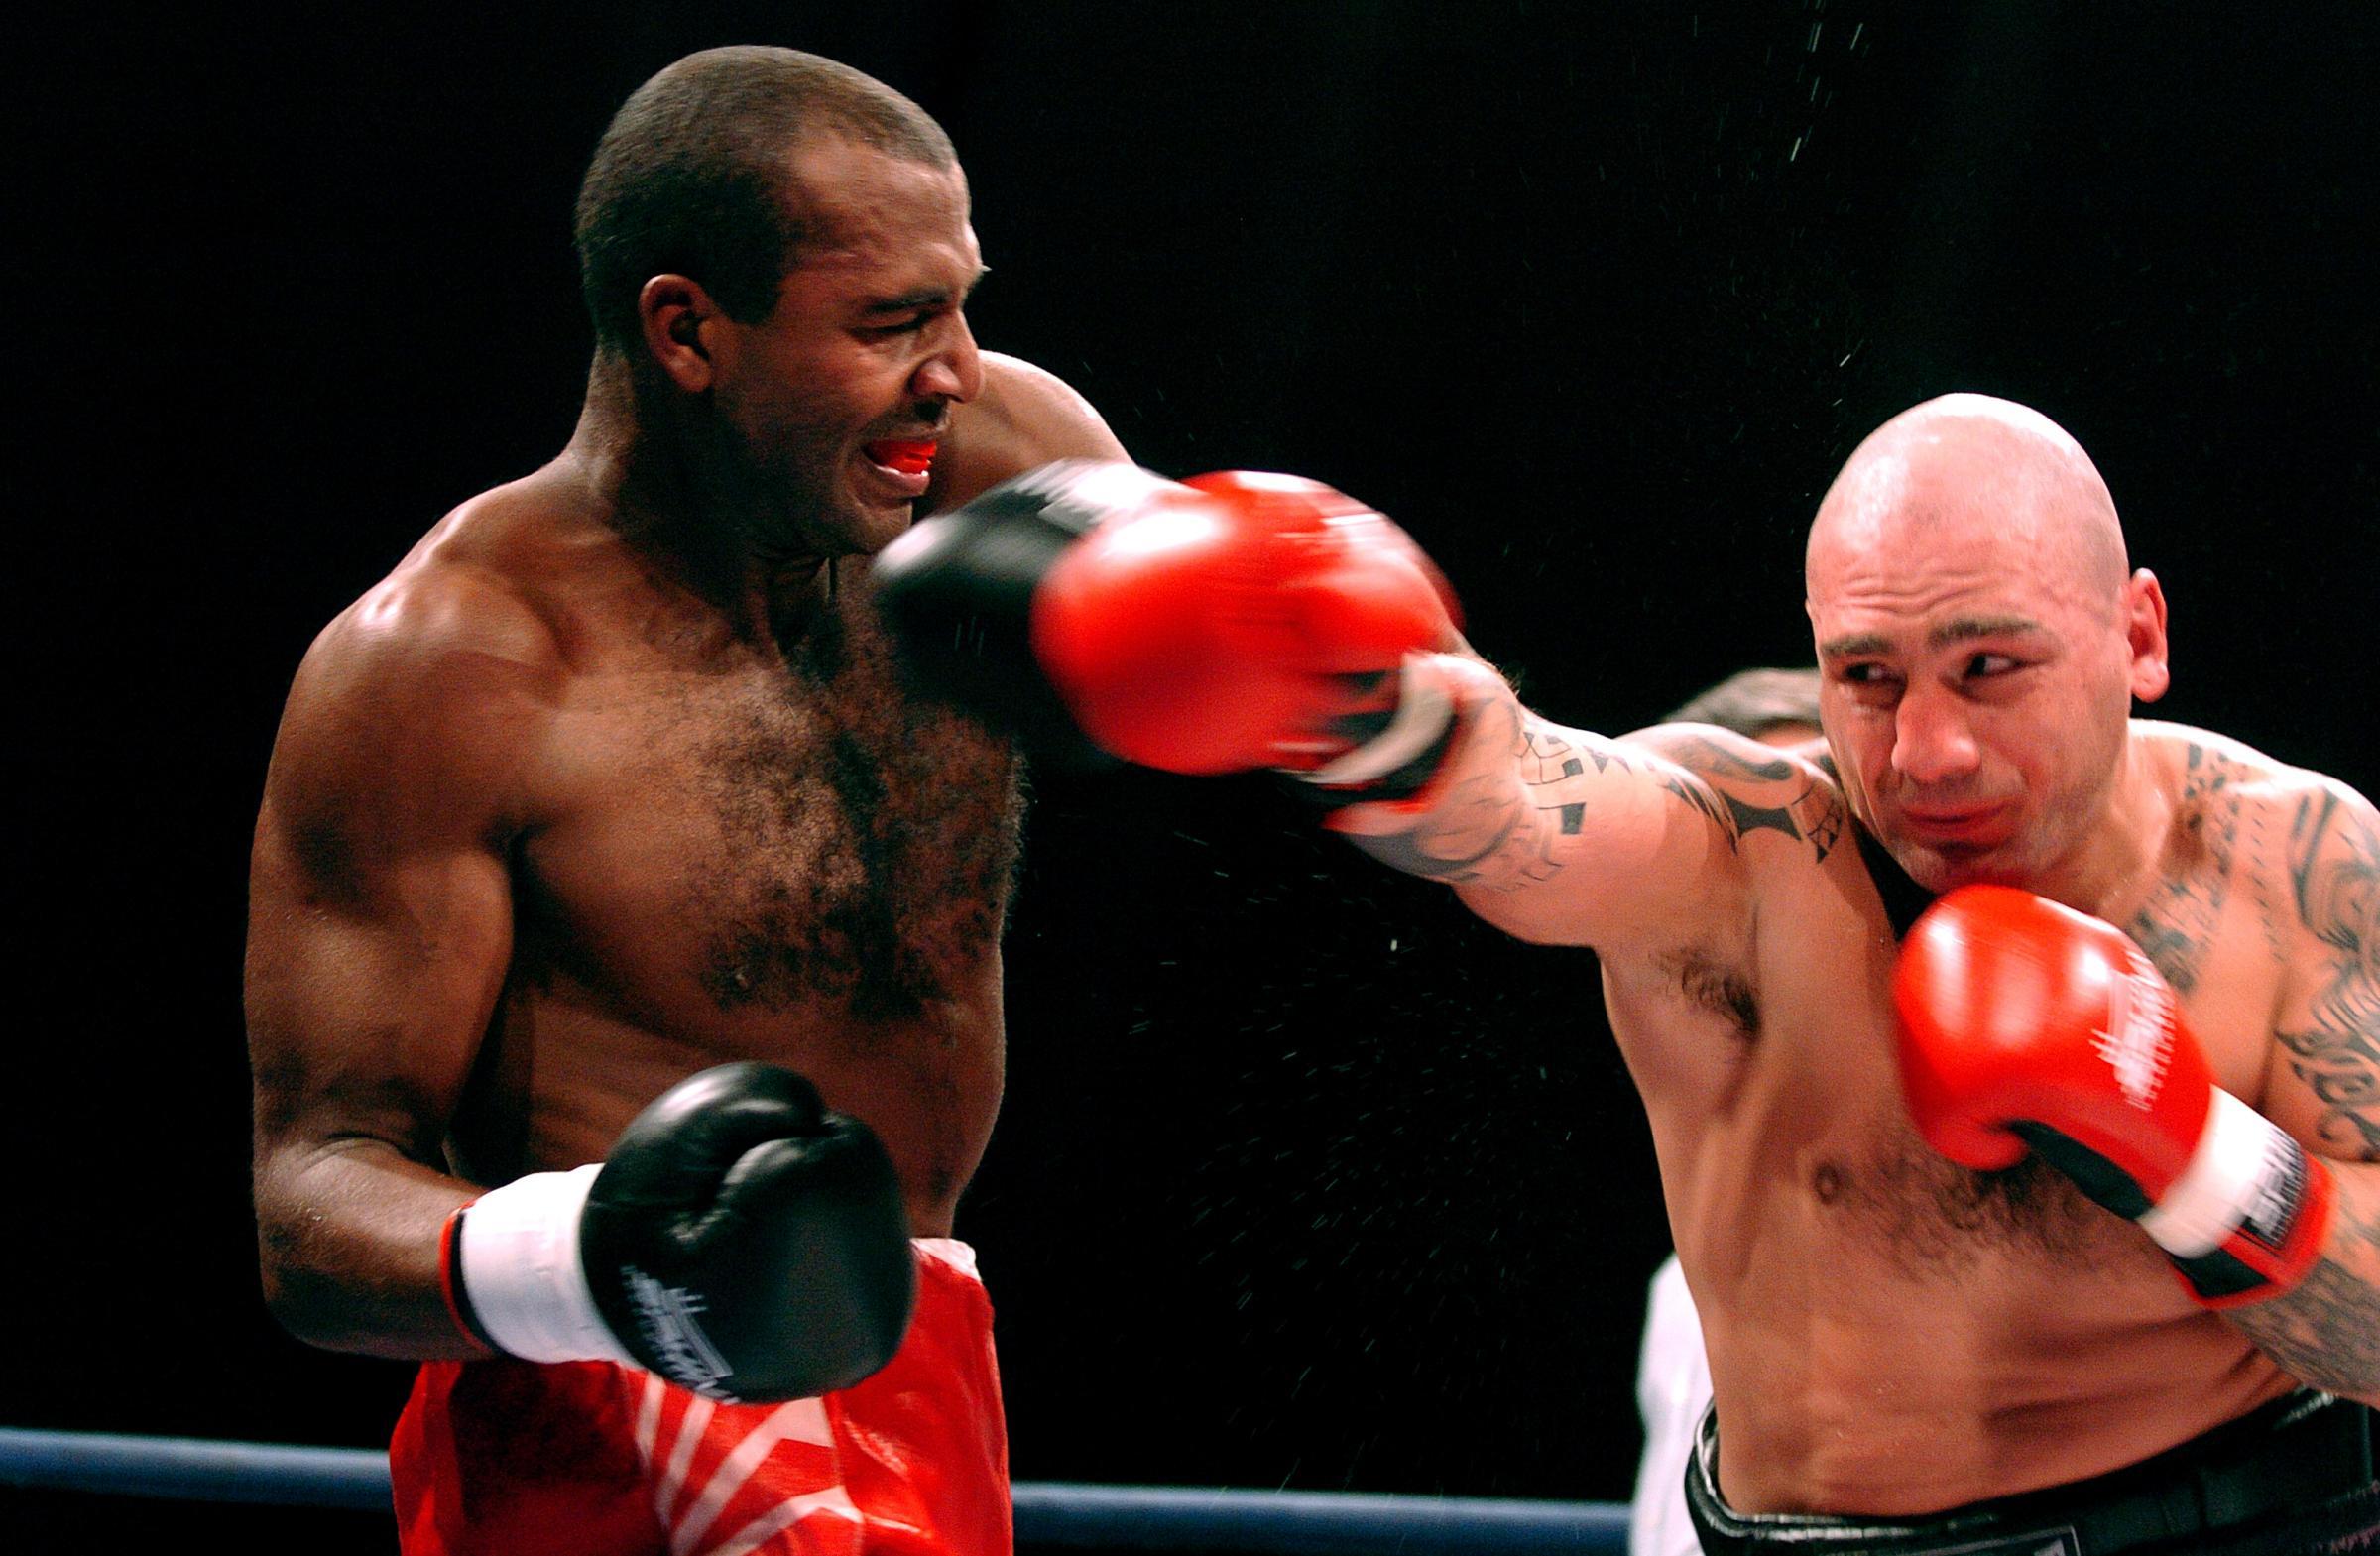 L'Isola dei famosi 11, Giacobbe Fragomeni: 'La boxe mi ha salvato la vita'